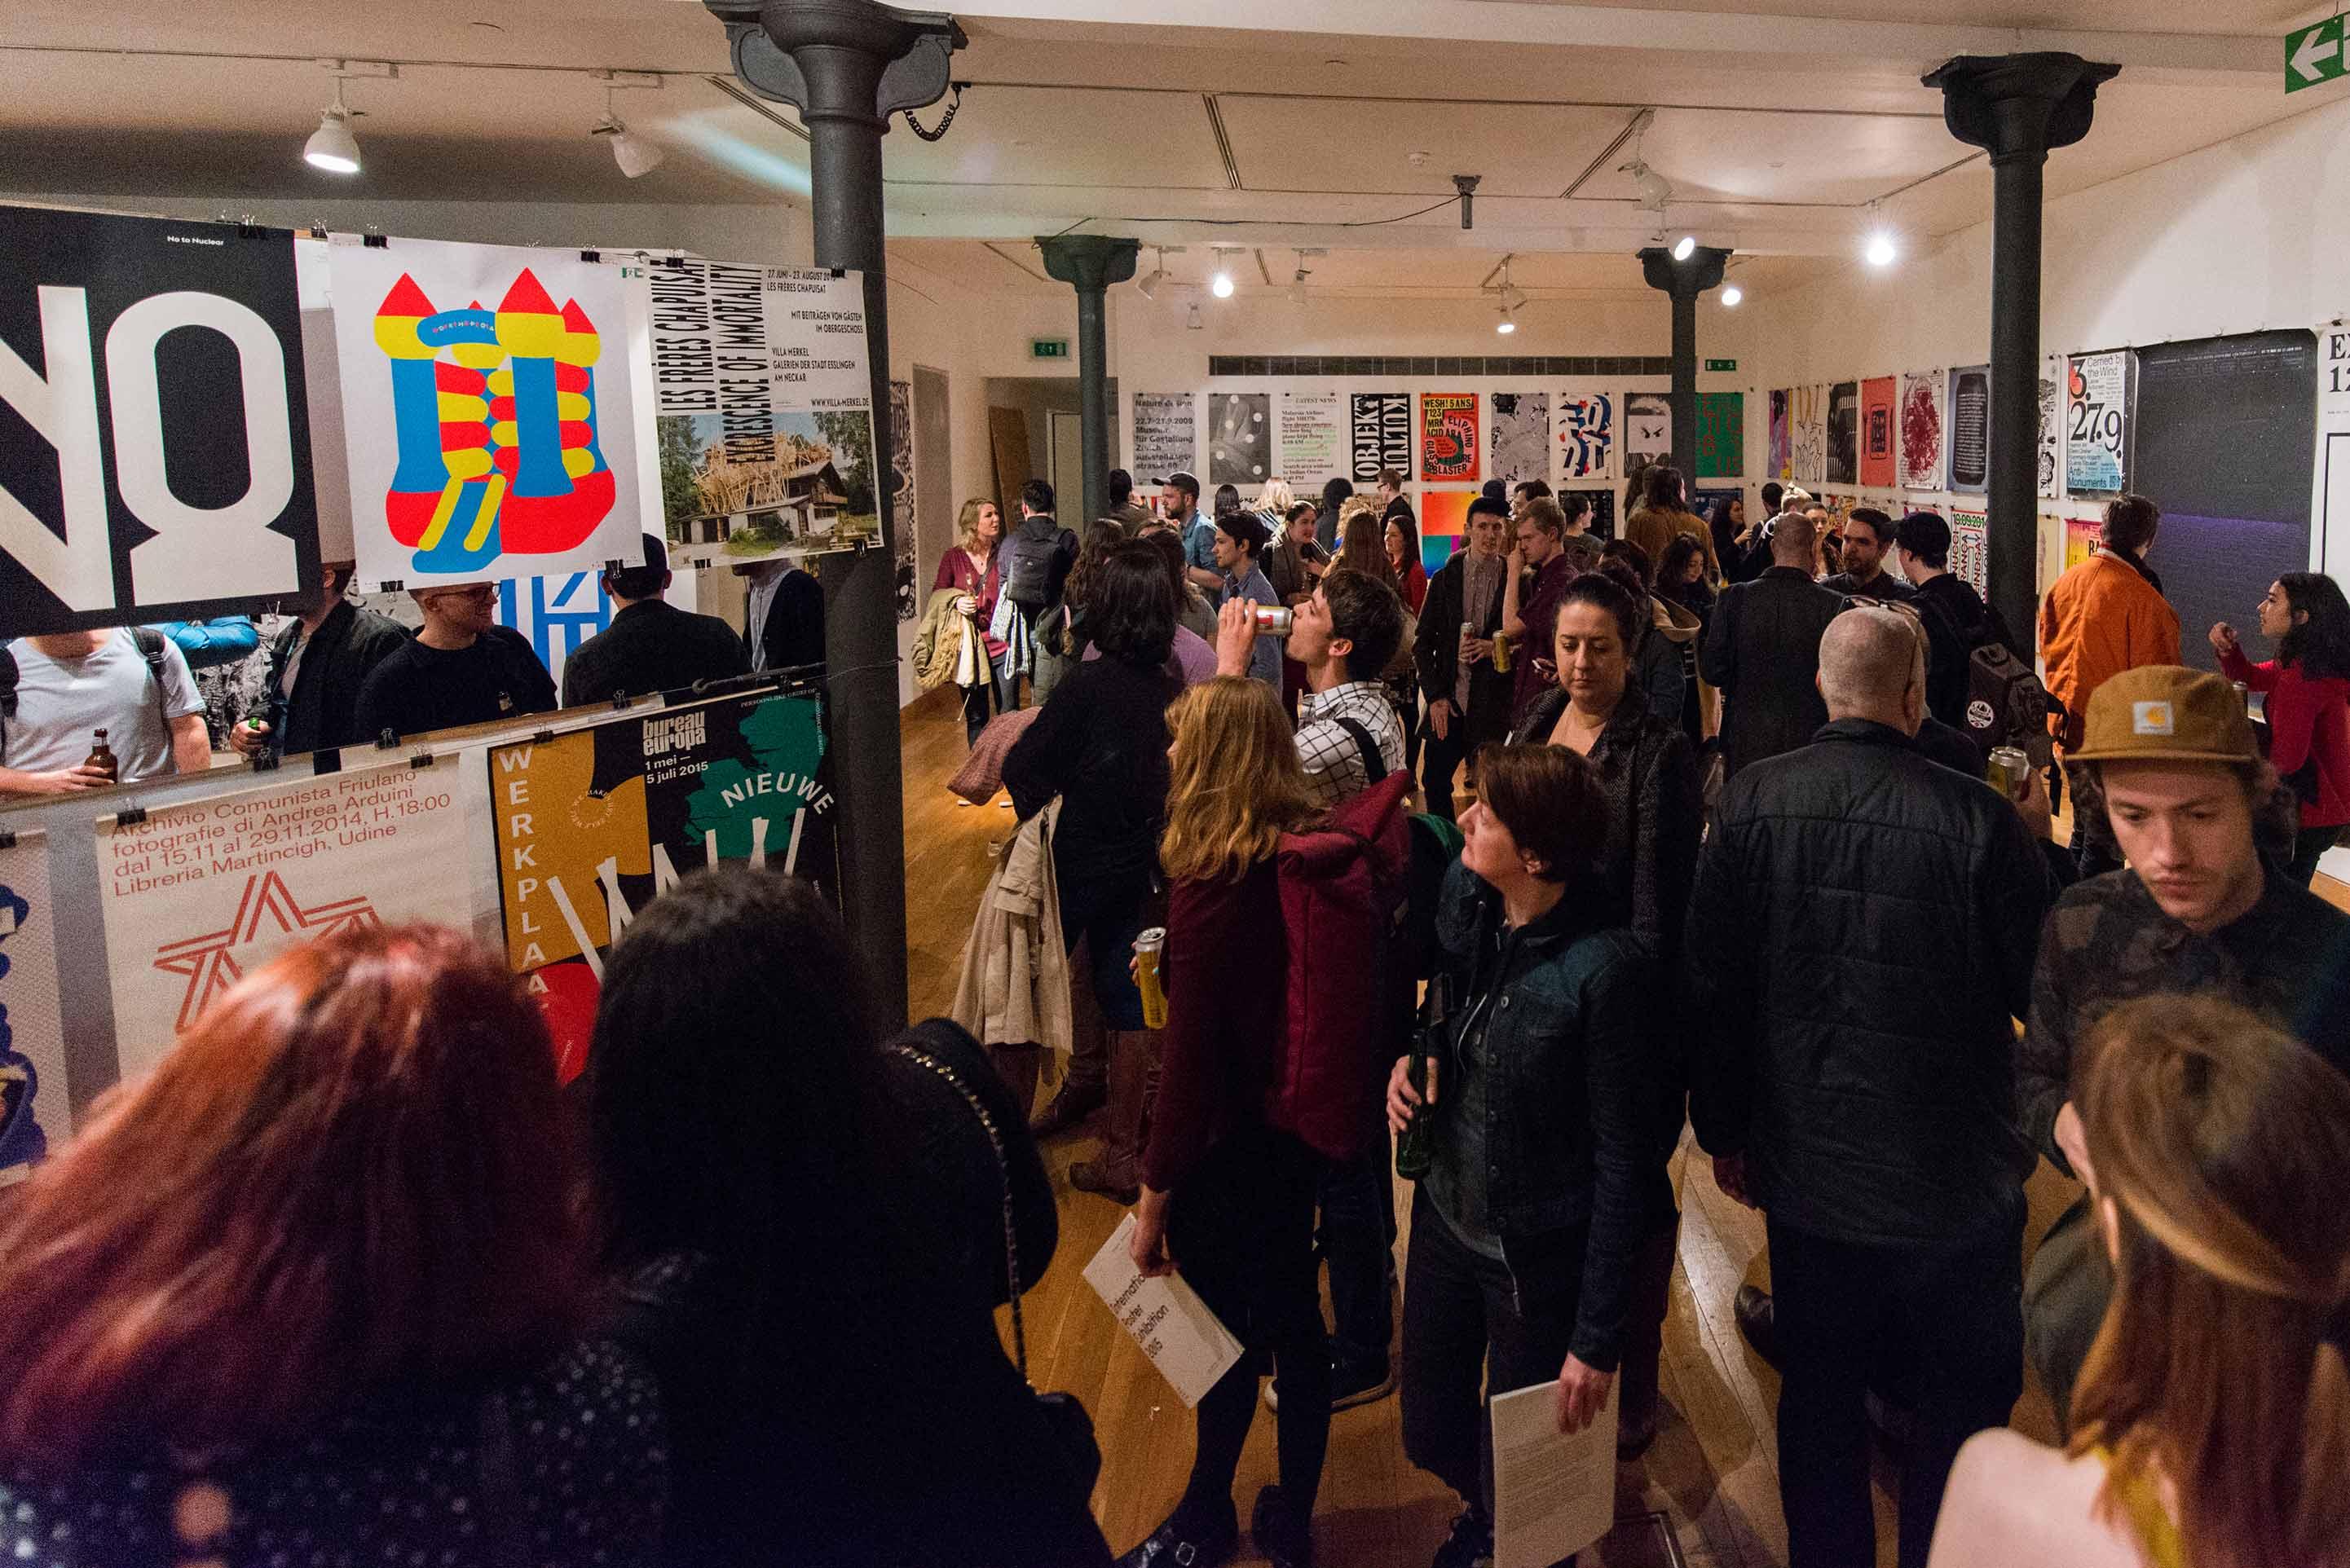 4graphicdesignfestivalscotland-2015-launch